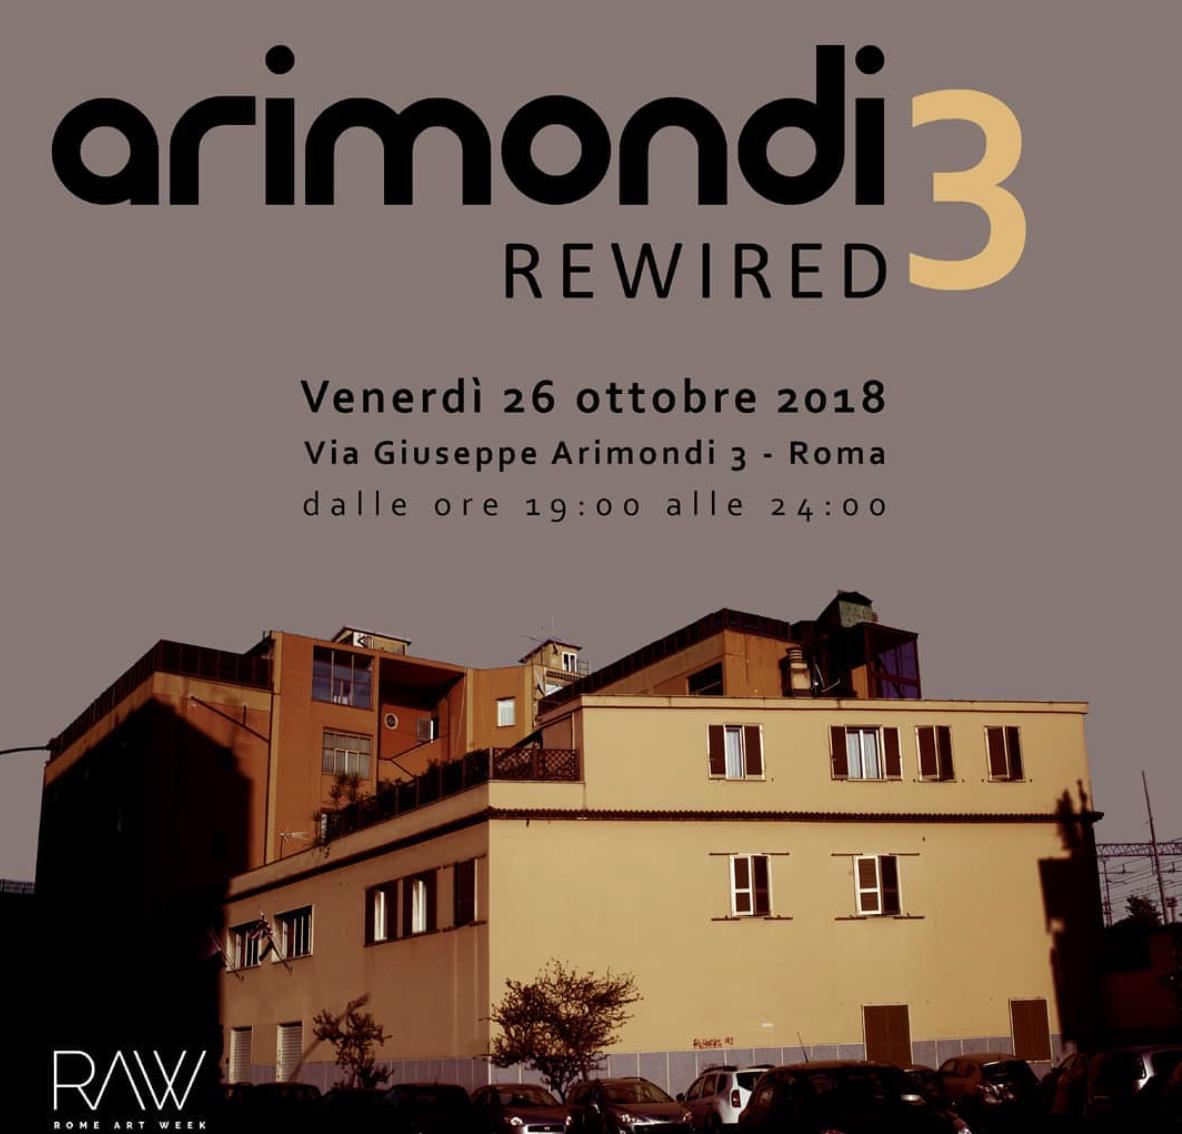 http://www.arte.it/calendario-arte/roma/mostra-arimondi-3-rewired-55613